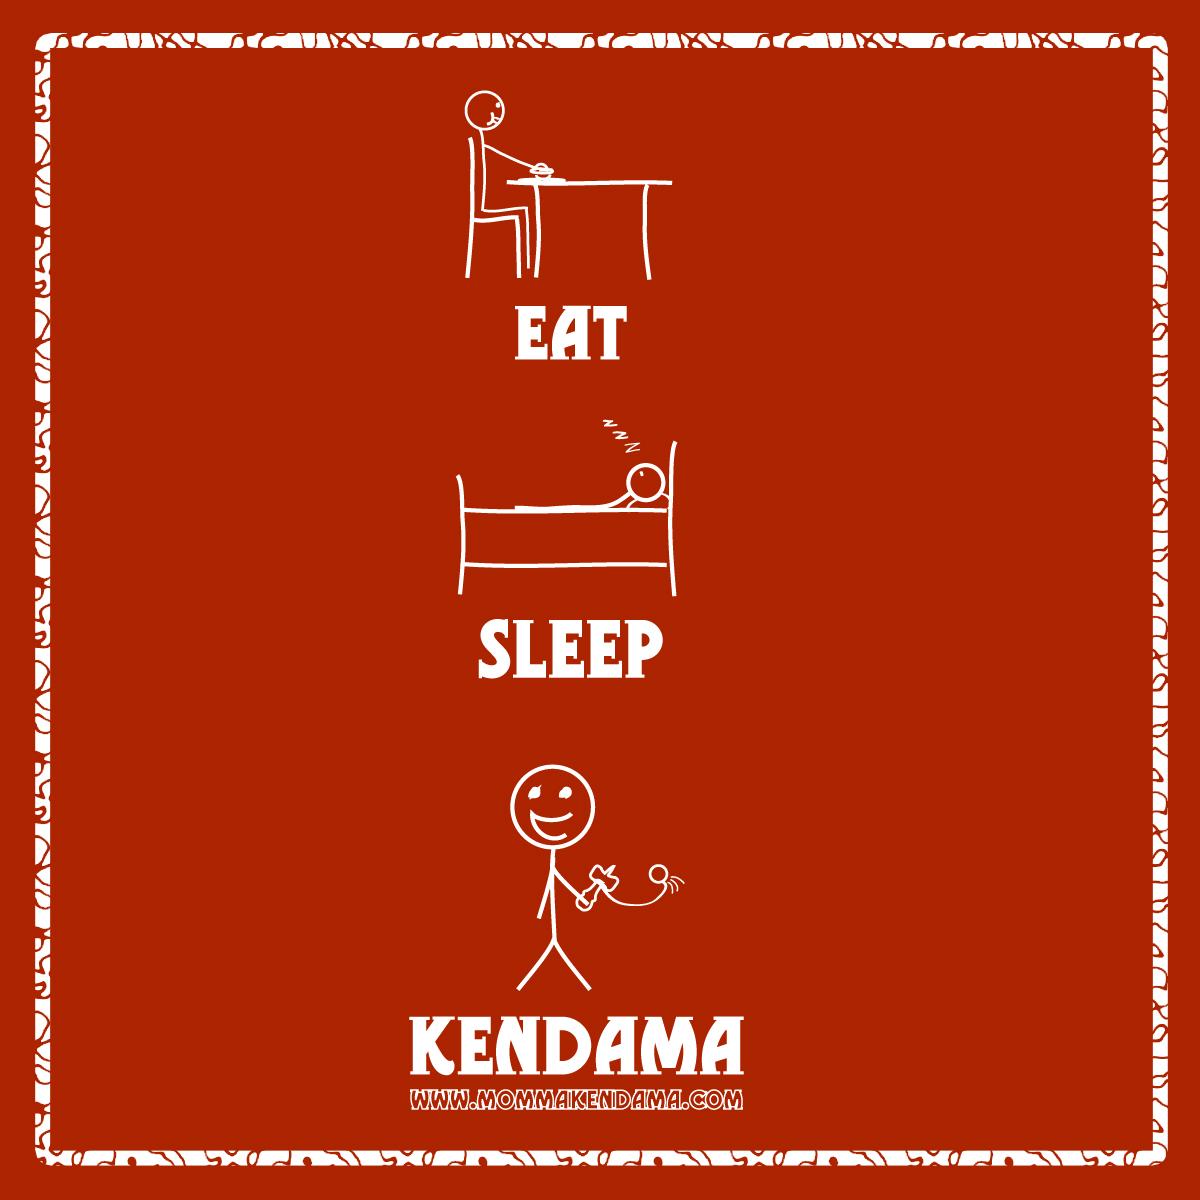 'eat. sleep. kendama.' sticker